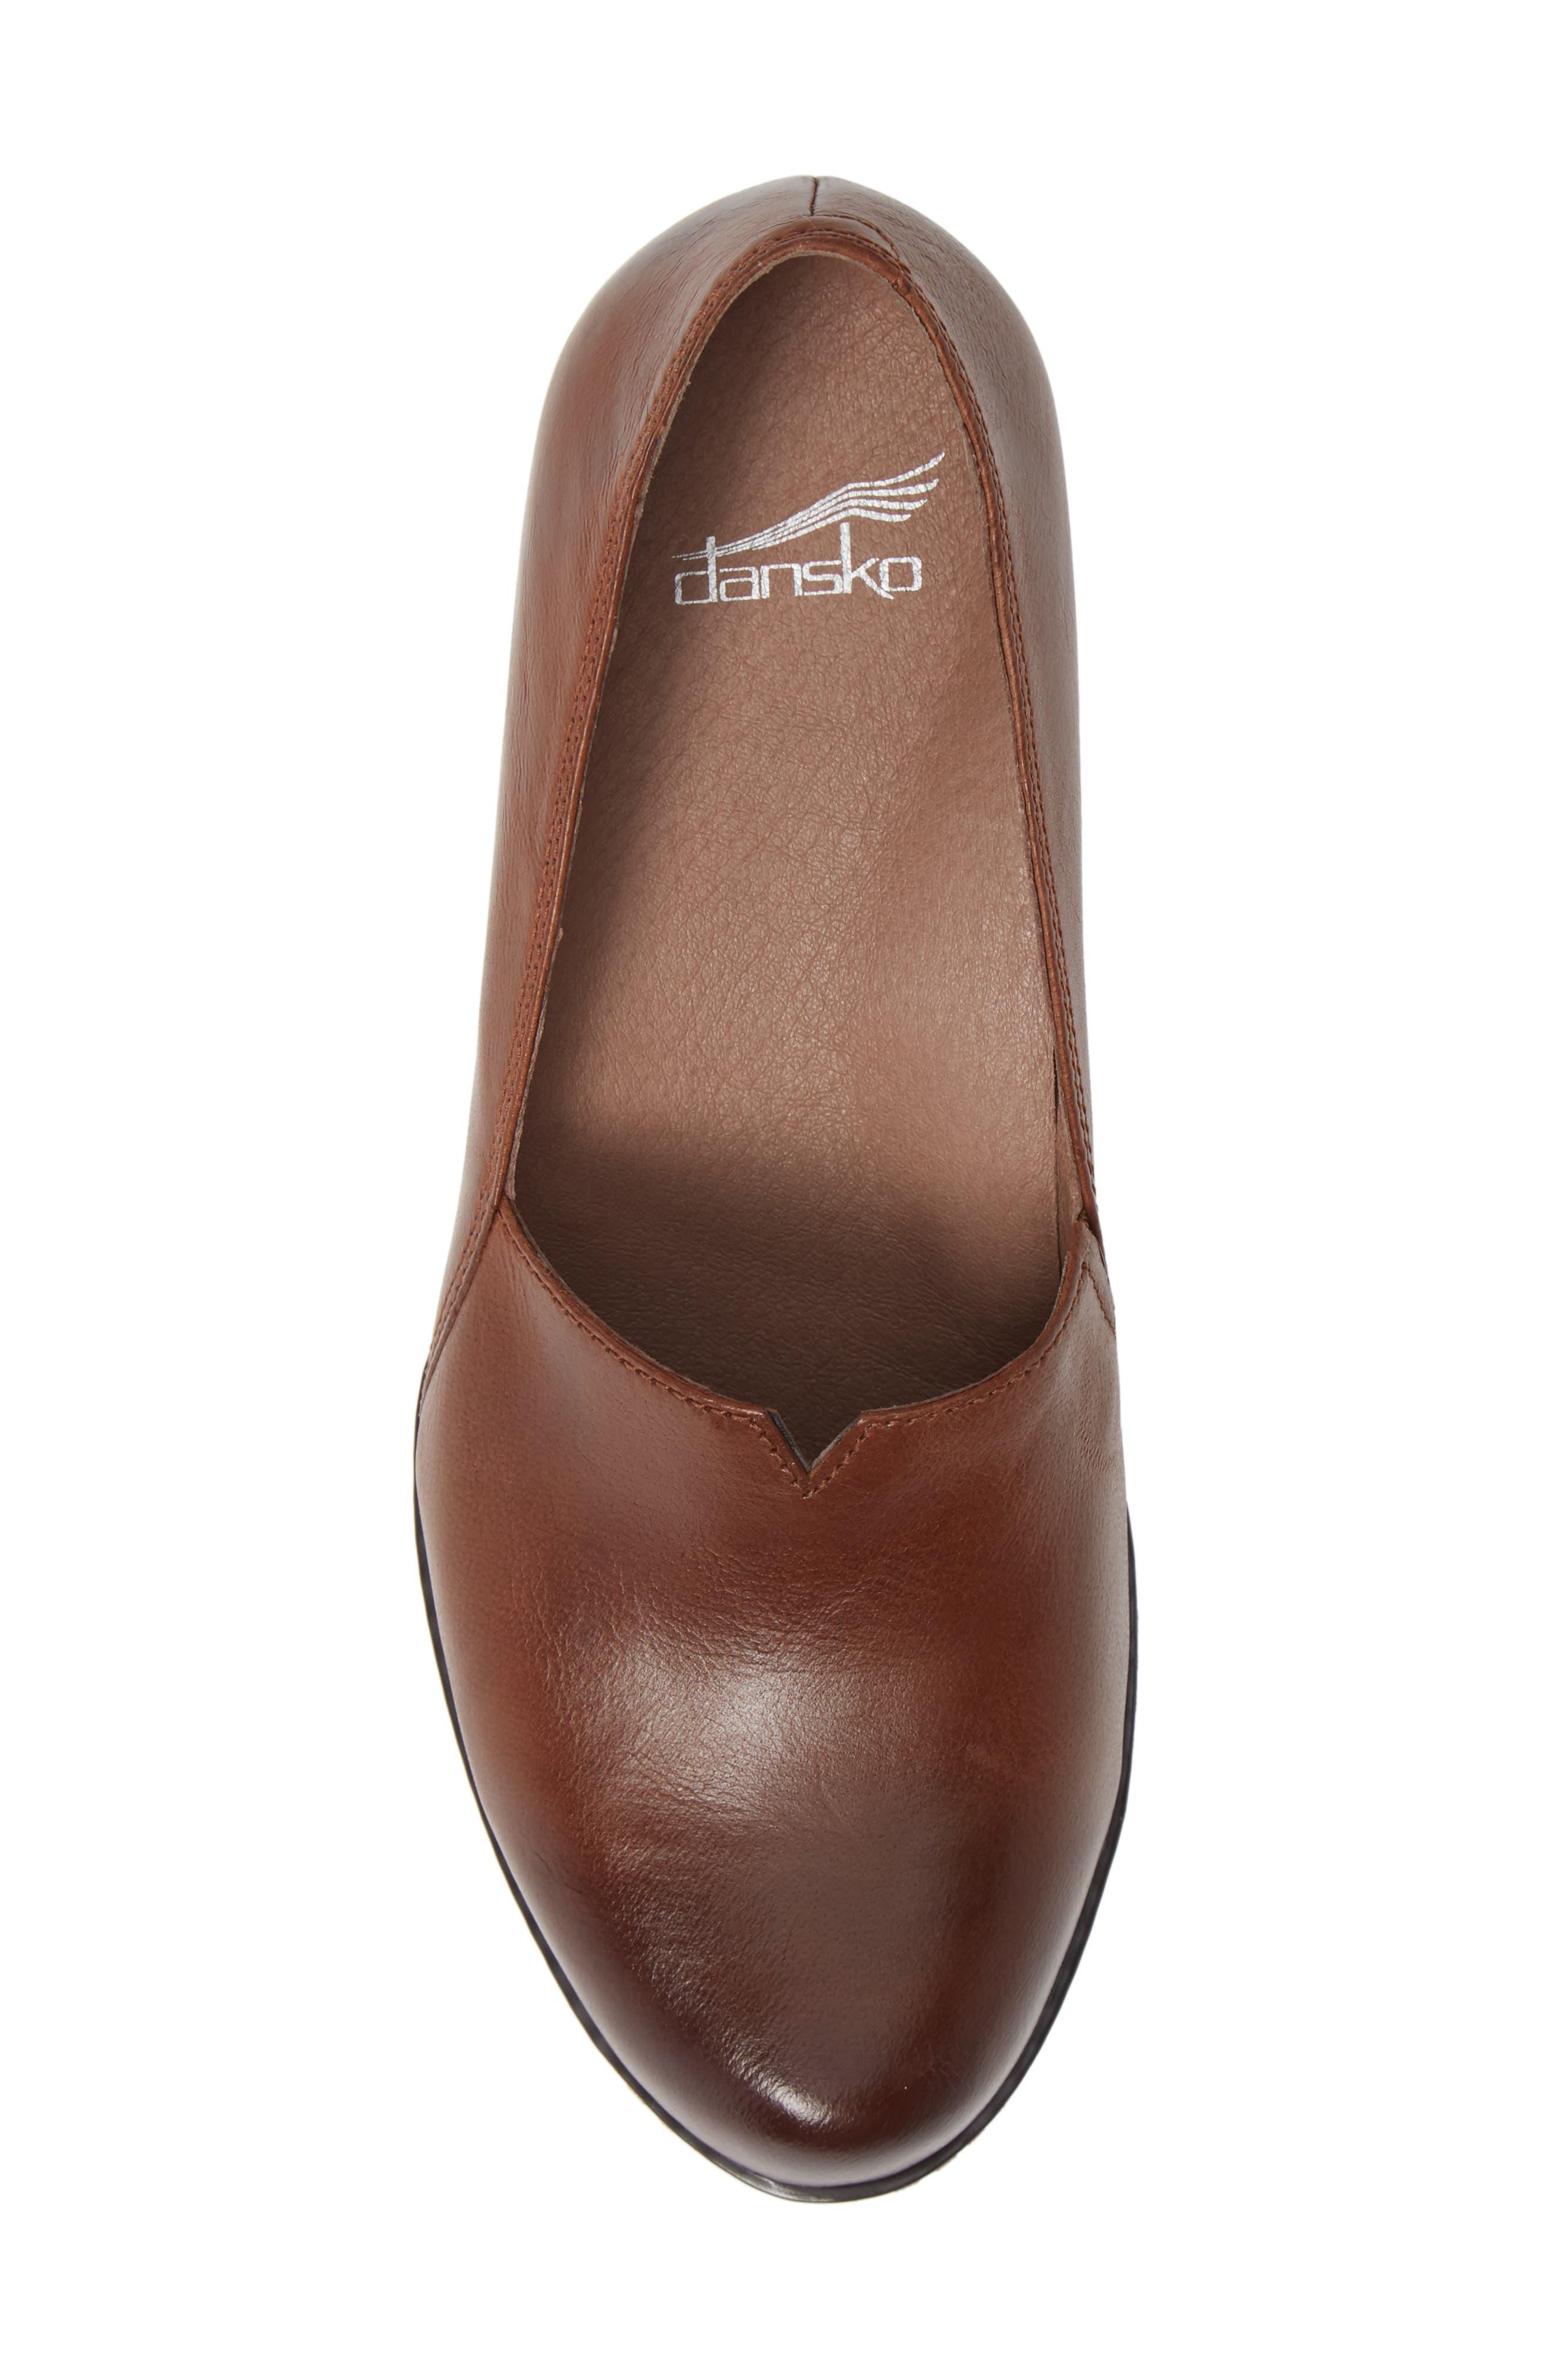 Liliana Concealed Wedge Slip-On,                             Alternate thumbnail 8, color,                             Chestnut Burnished Leather